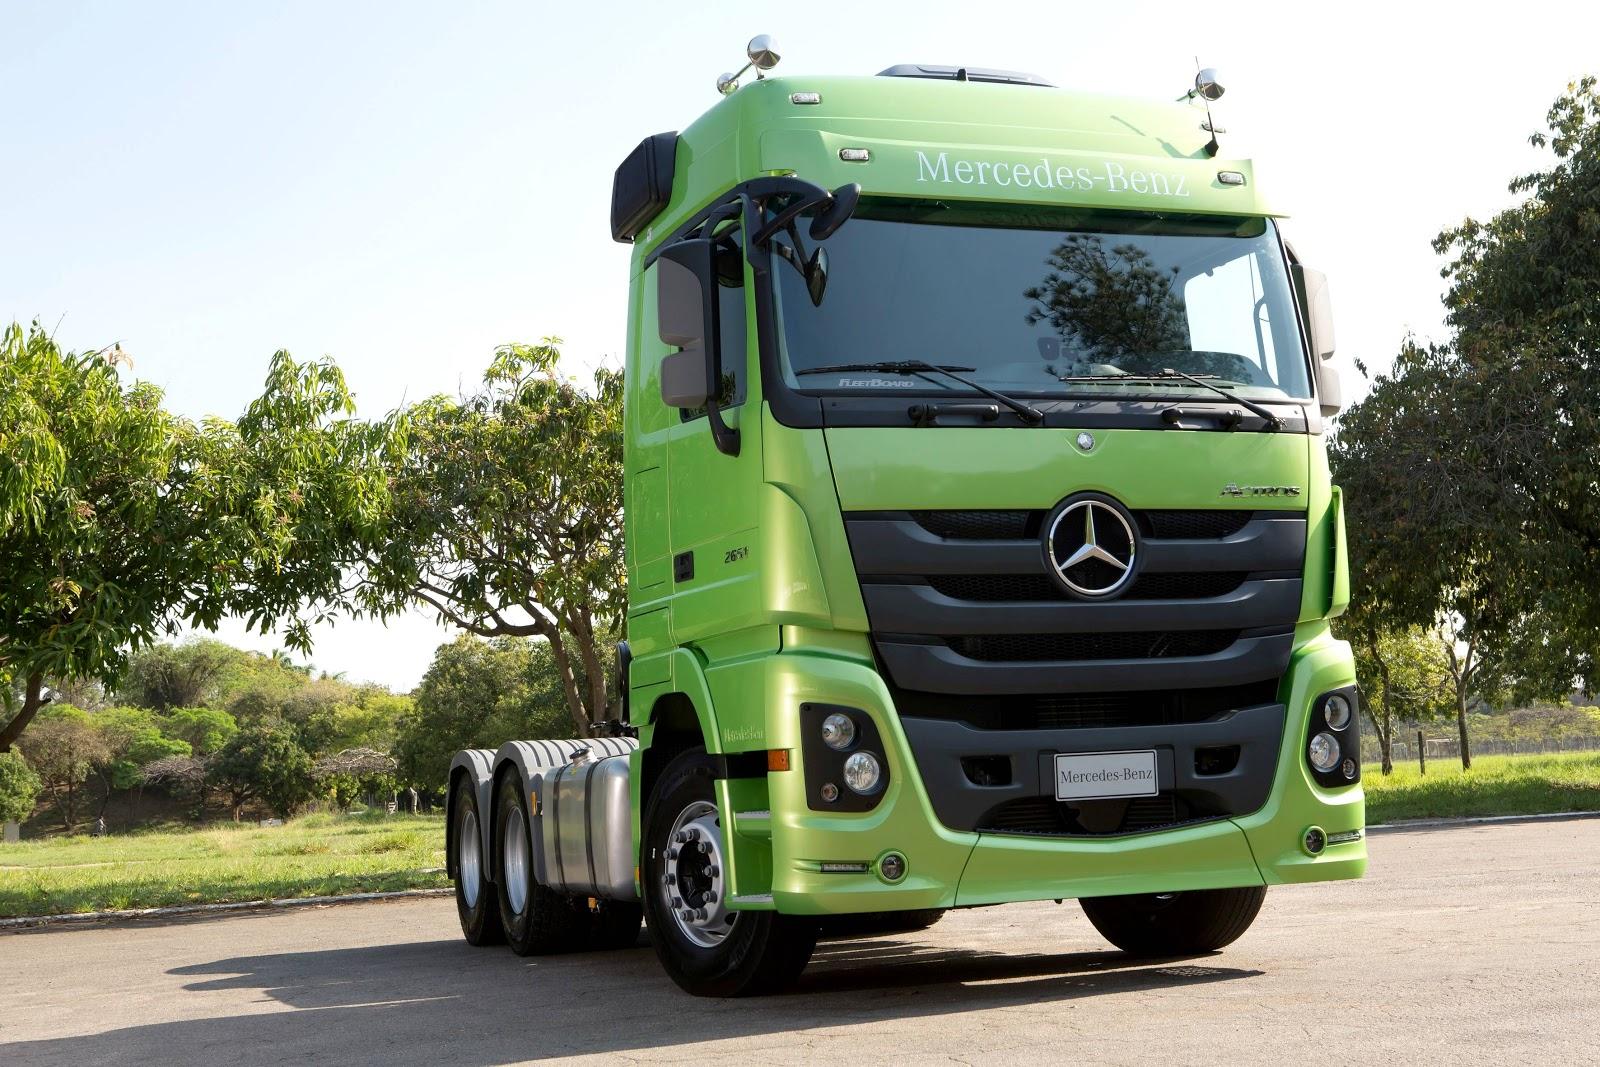 Mercedes-Benz Actros '16 (Commercial vehicles) - Trucksplanet